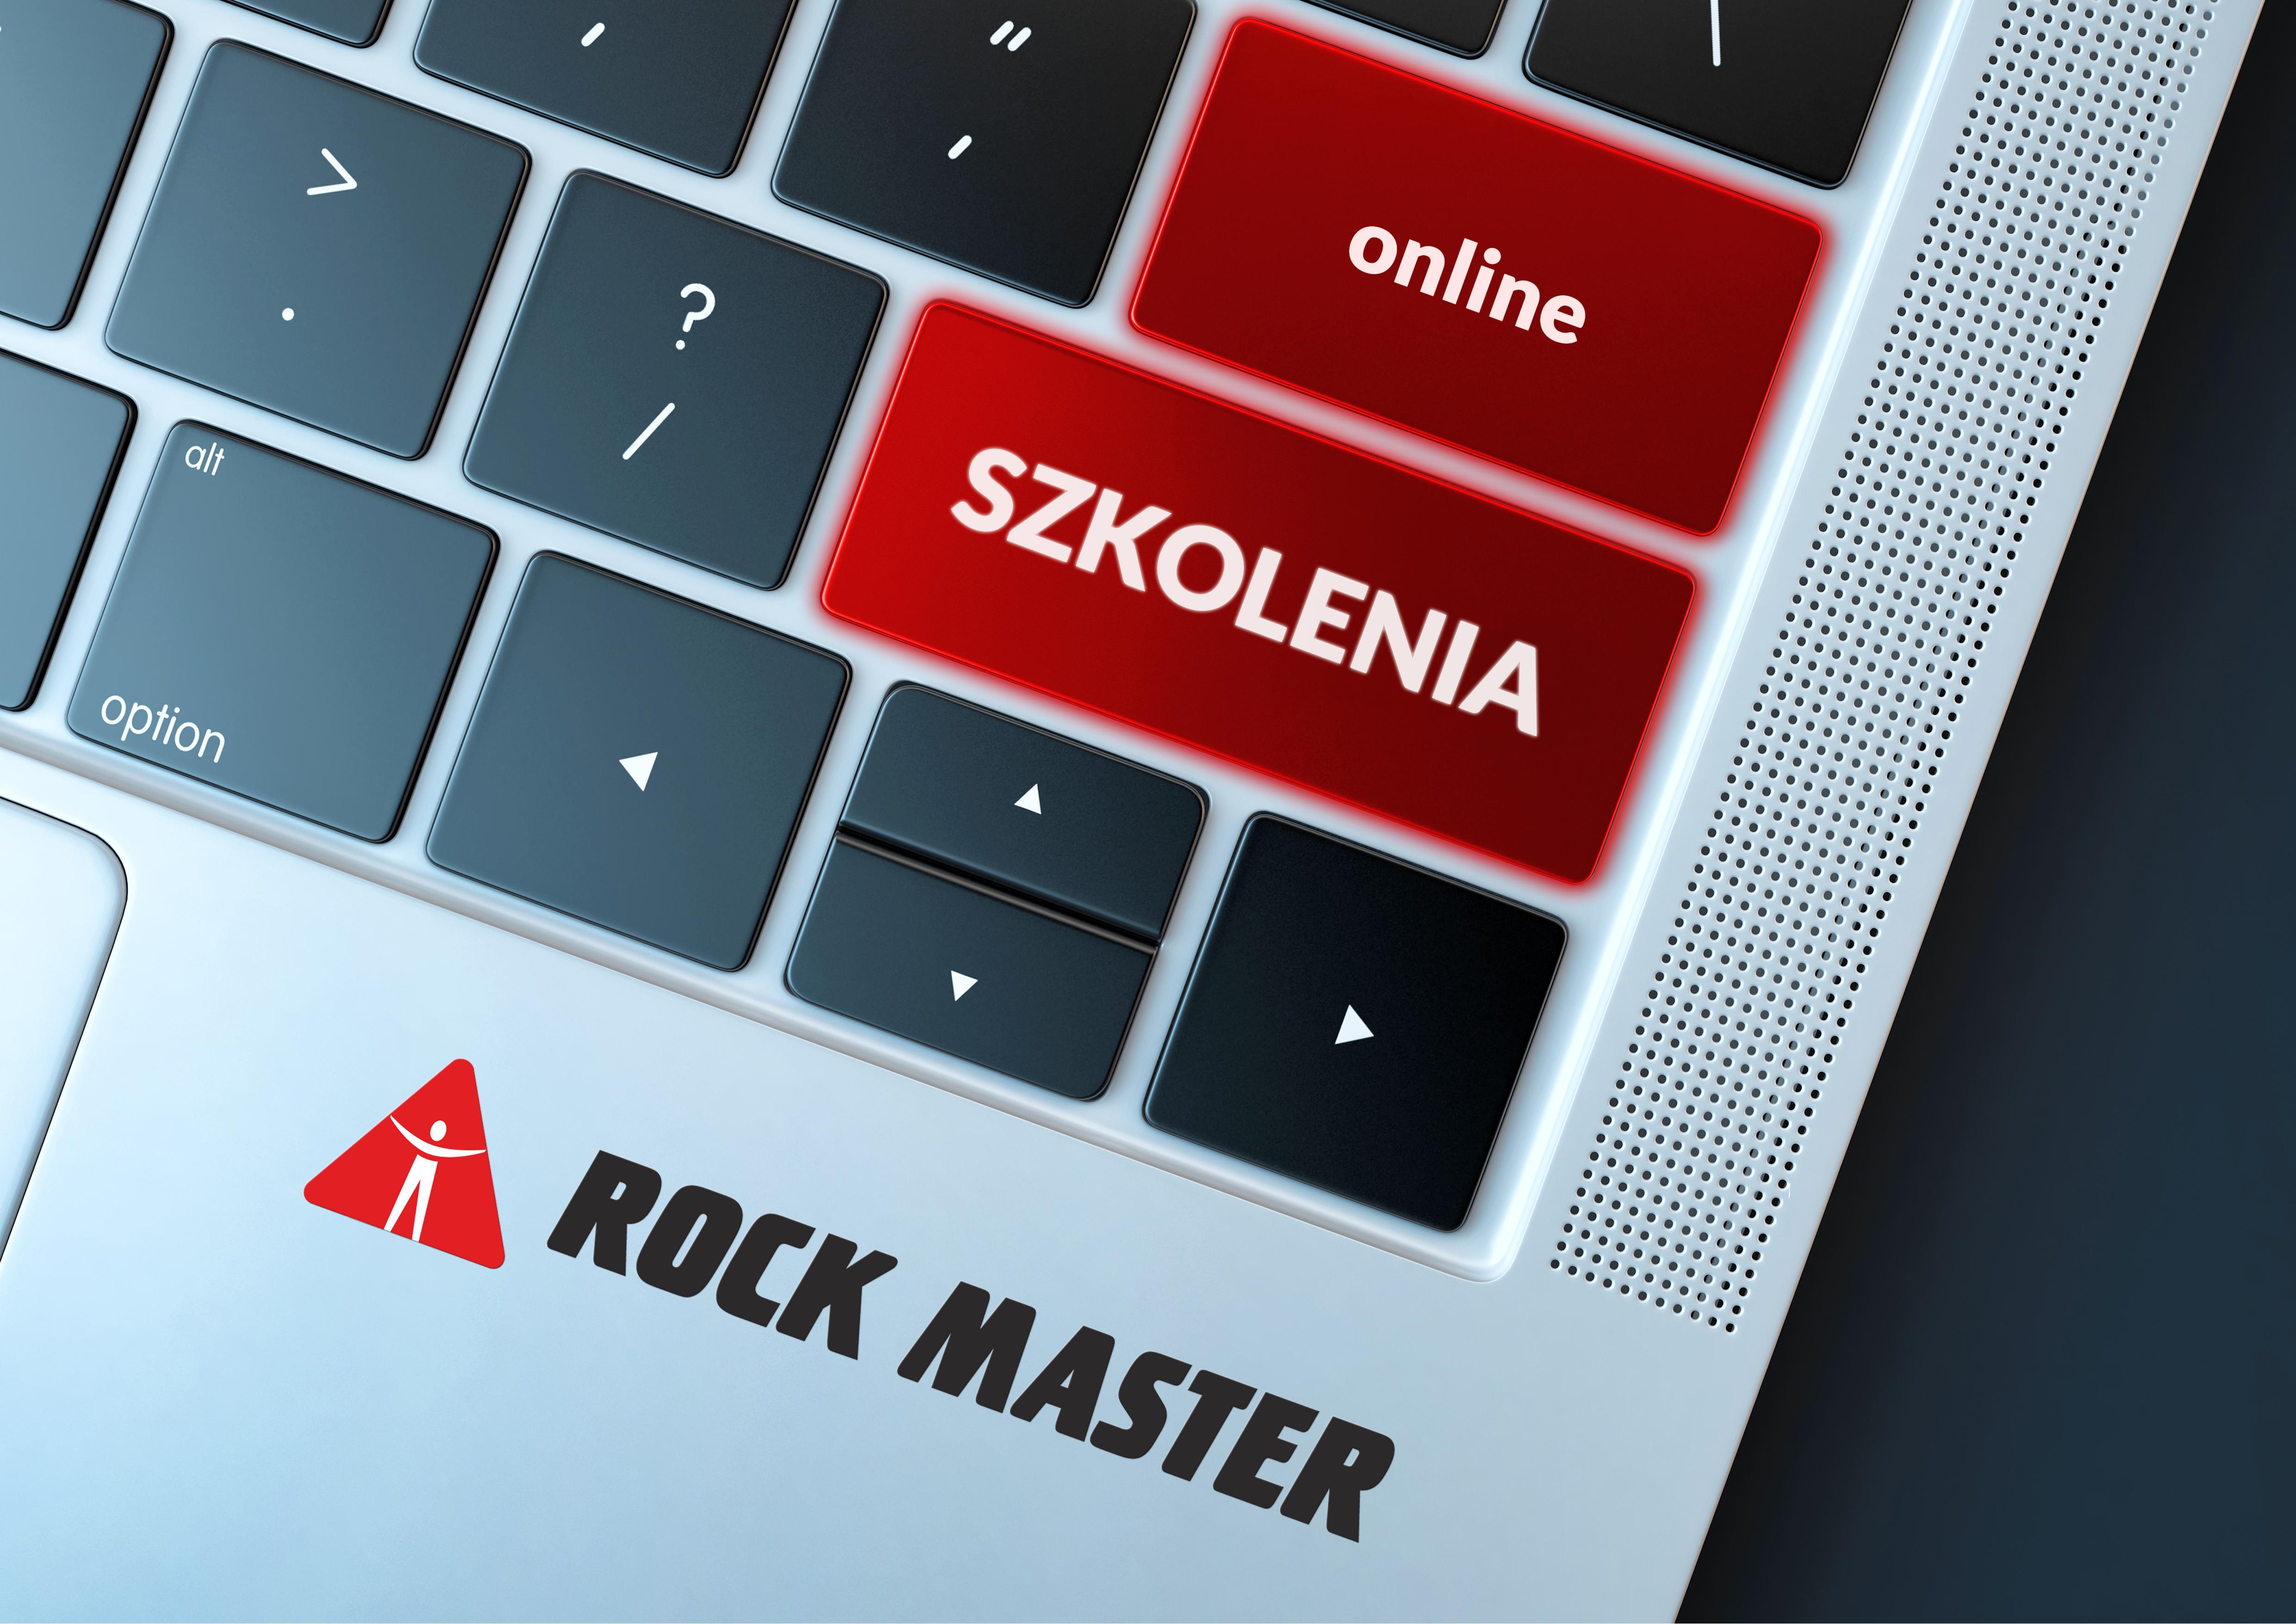 Rock Master Szkolenia Online